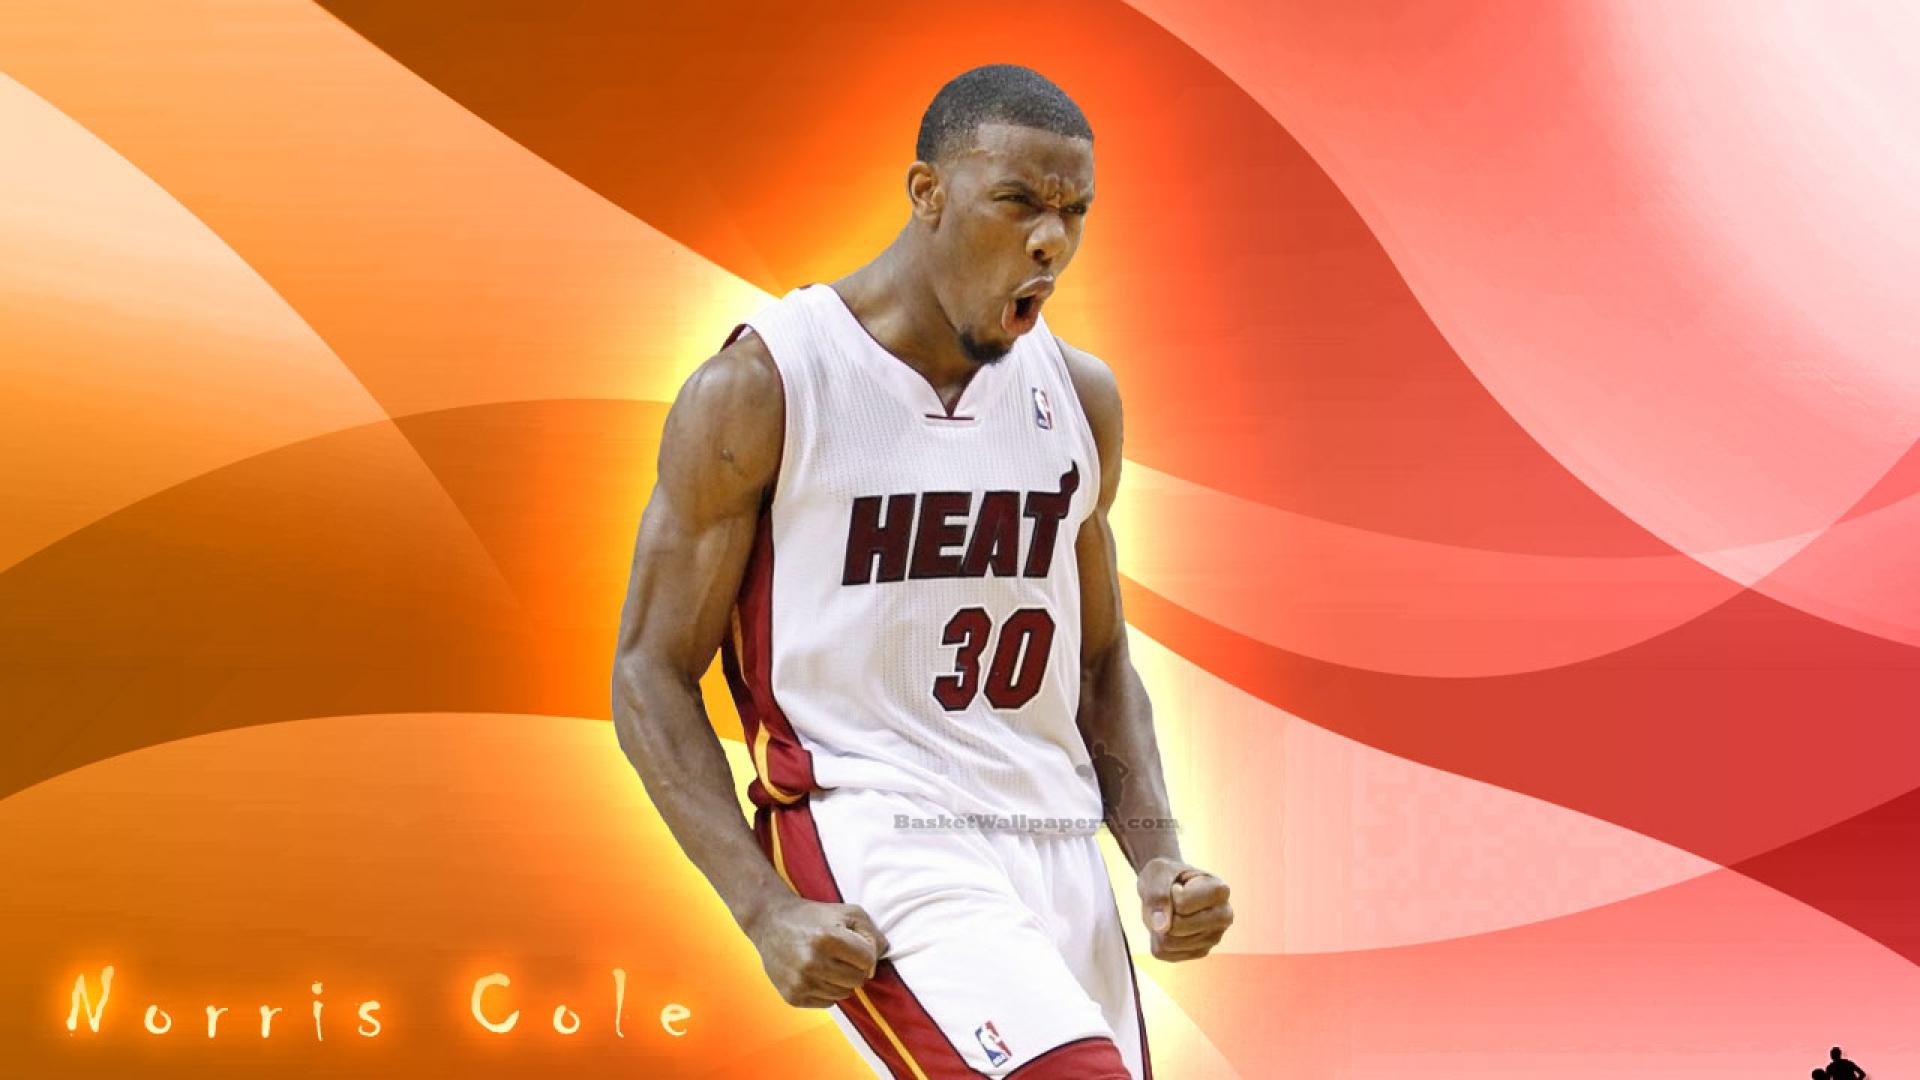 Norris Cole Basket Ball wallpaper